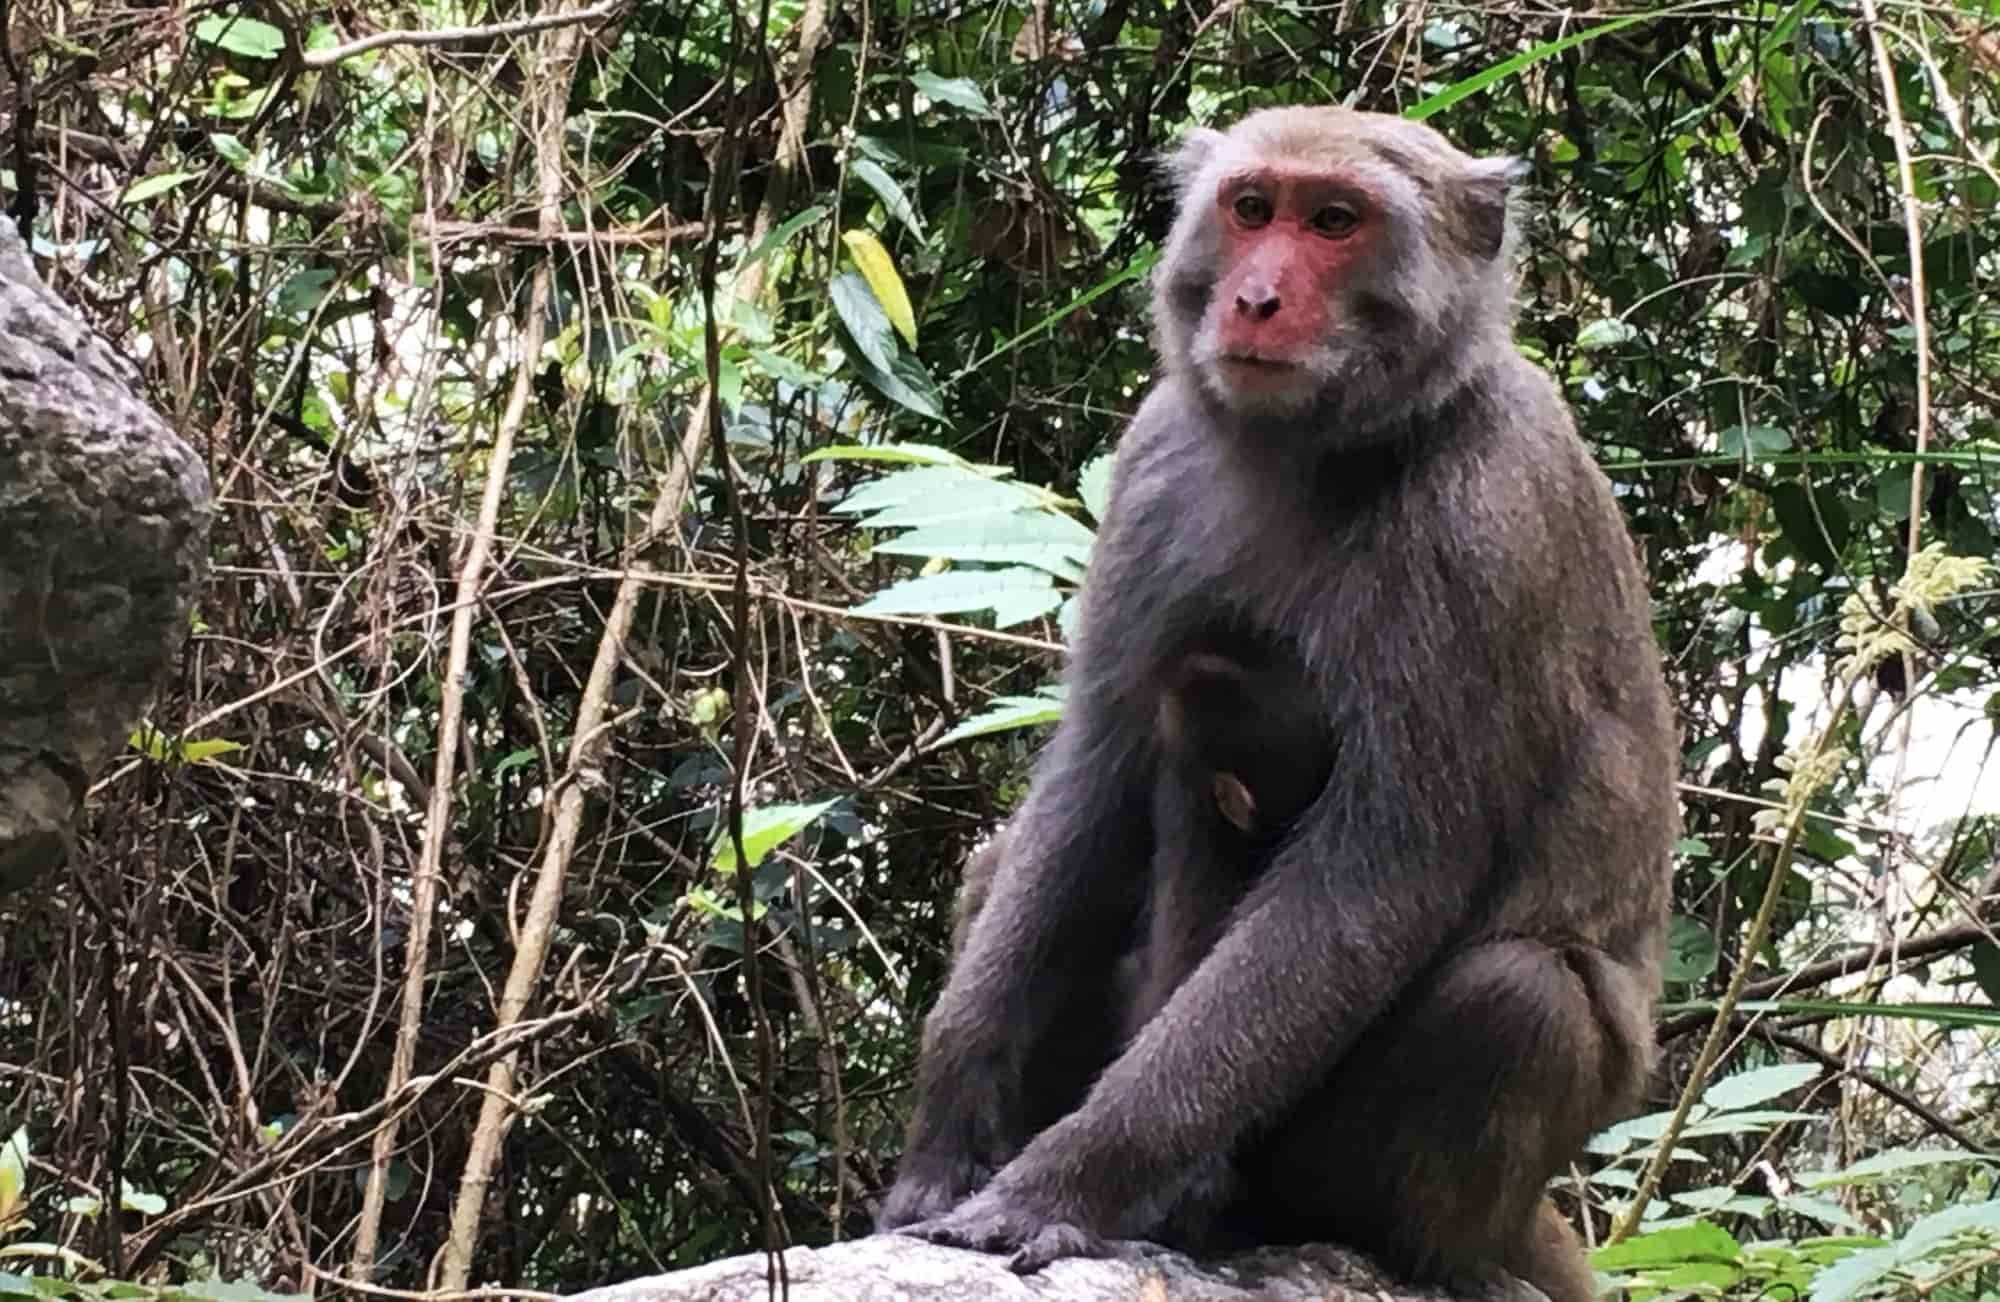 Voyage à Taïwan - Baiyang Trail - Amplitudes